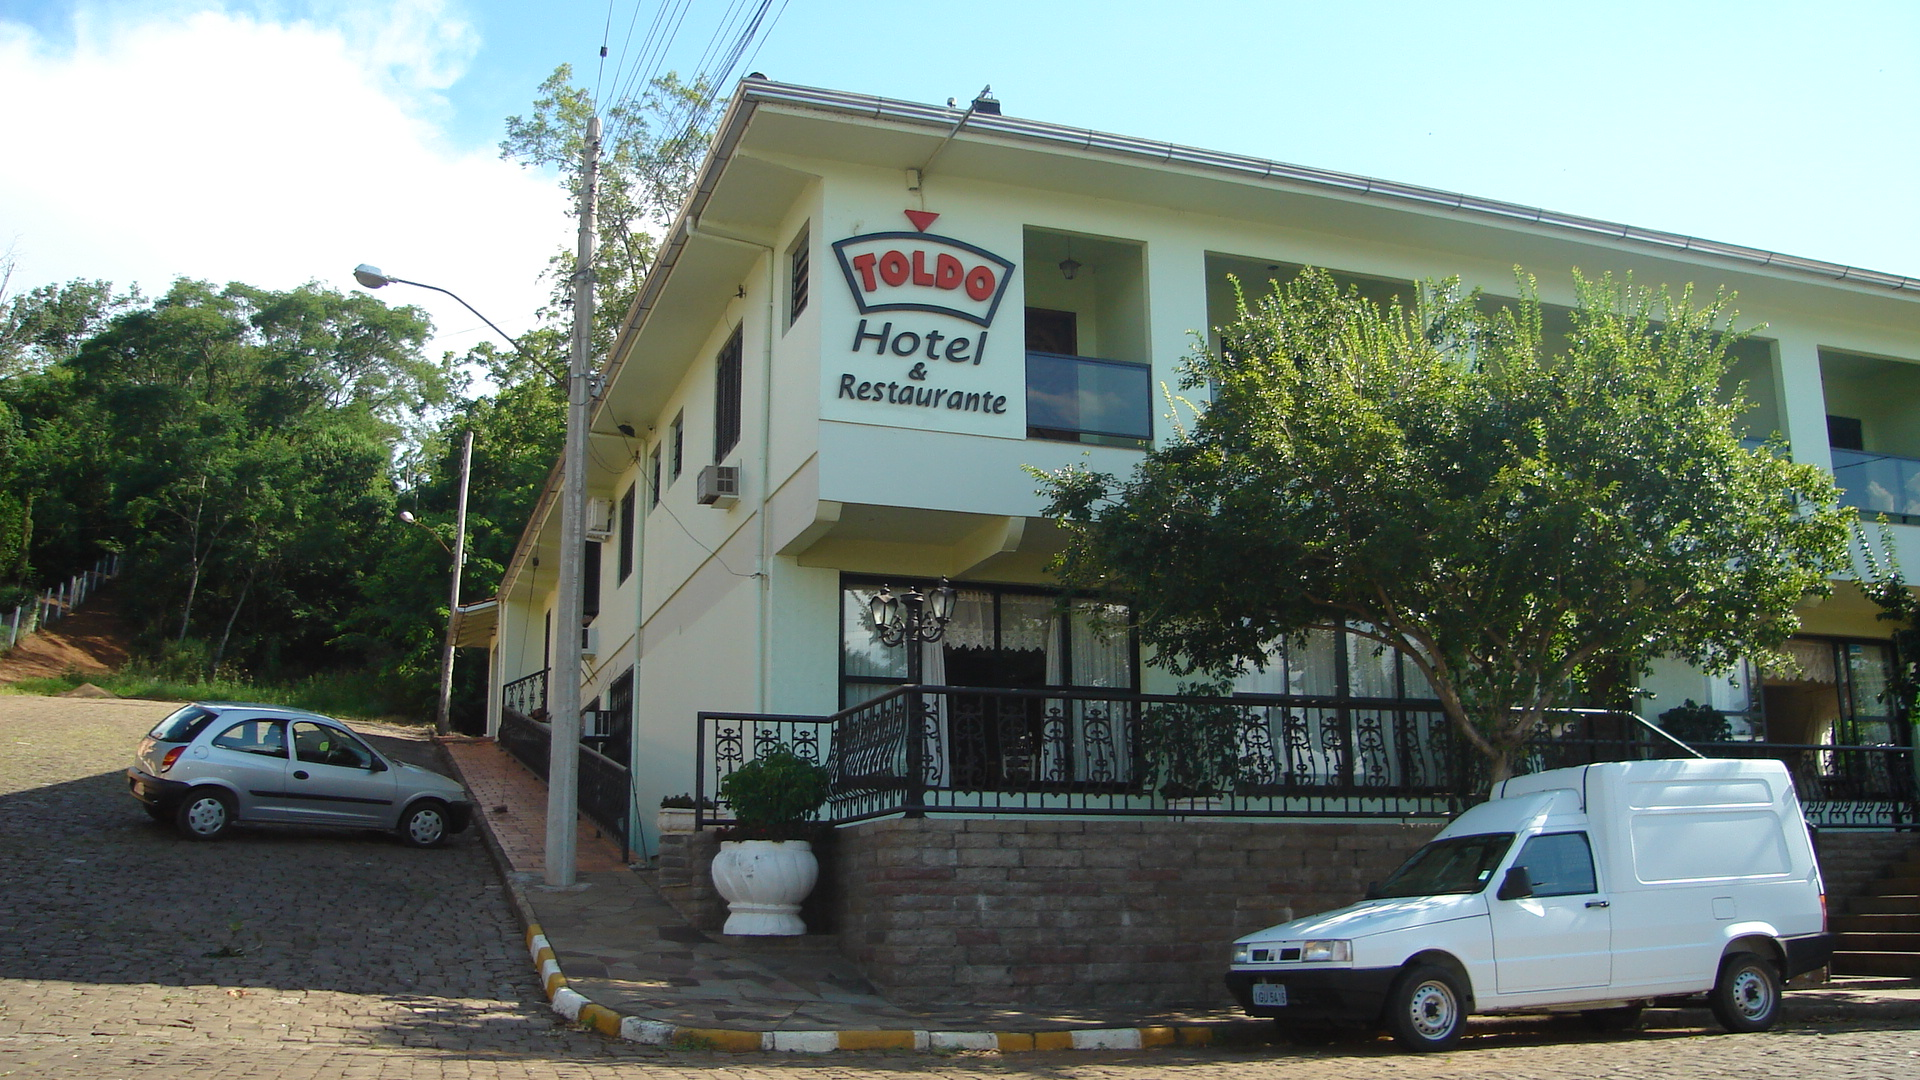 Hotel e Restaurante Toldo.